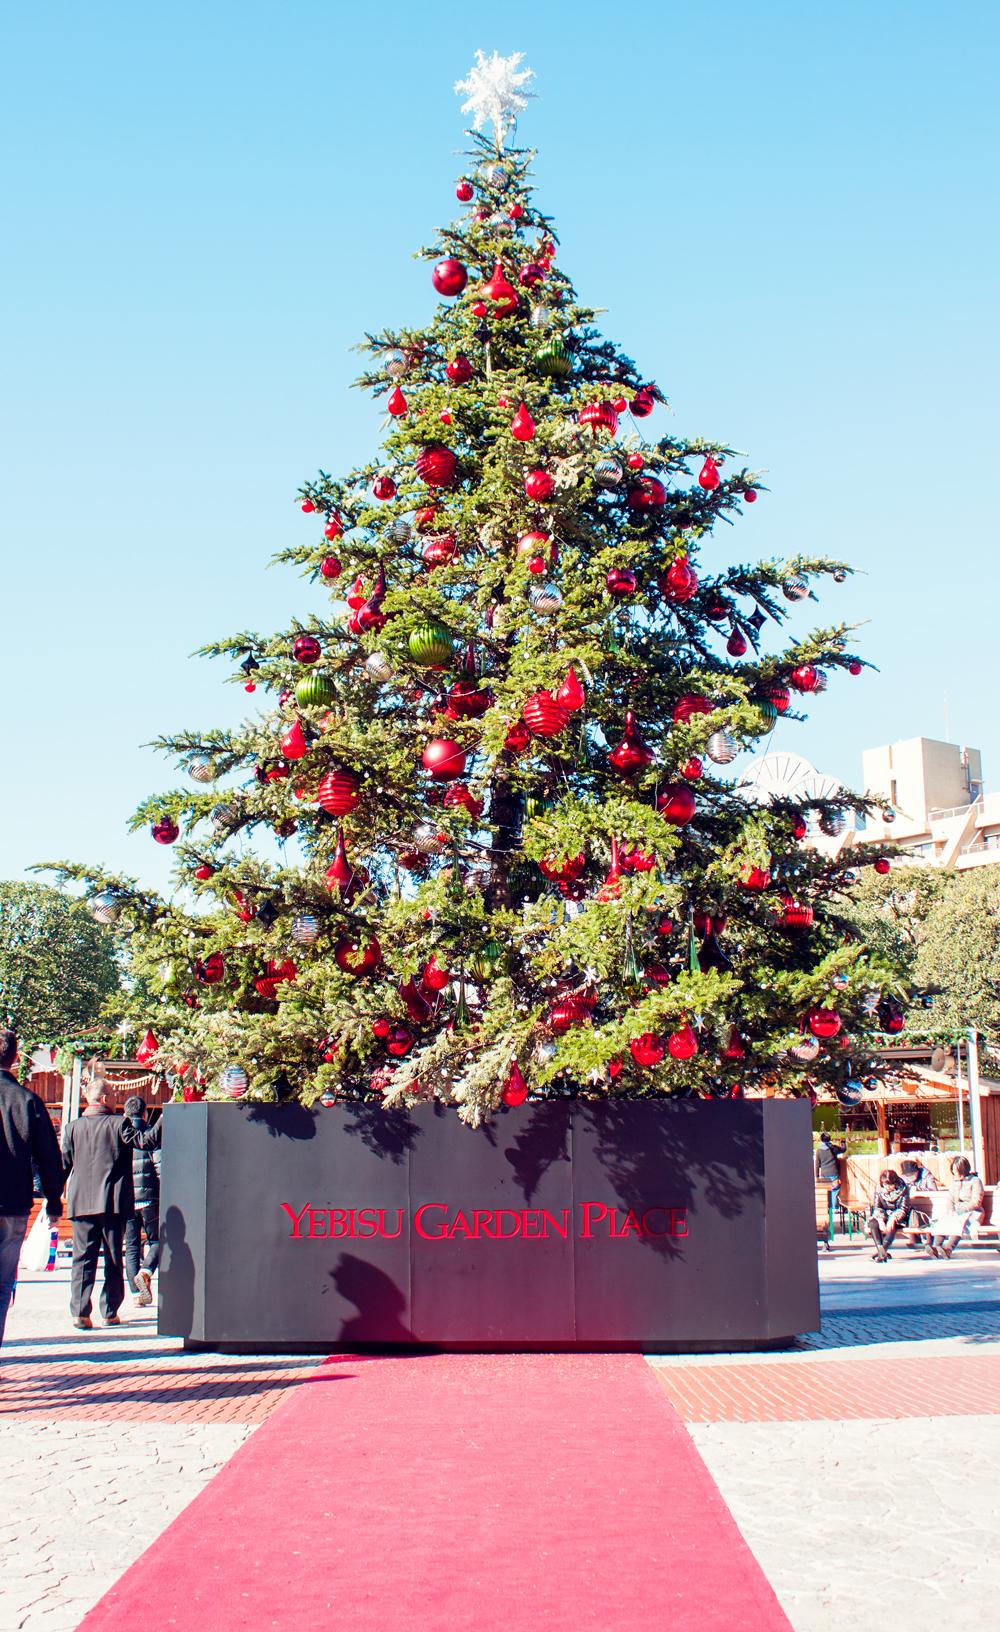 Yebisu Garden Place, baccarat eternal lights, Ebisu, Christmas market, crystal chandelier